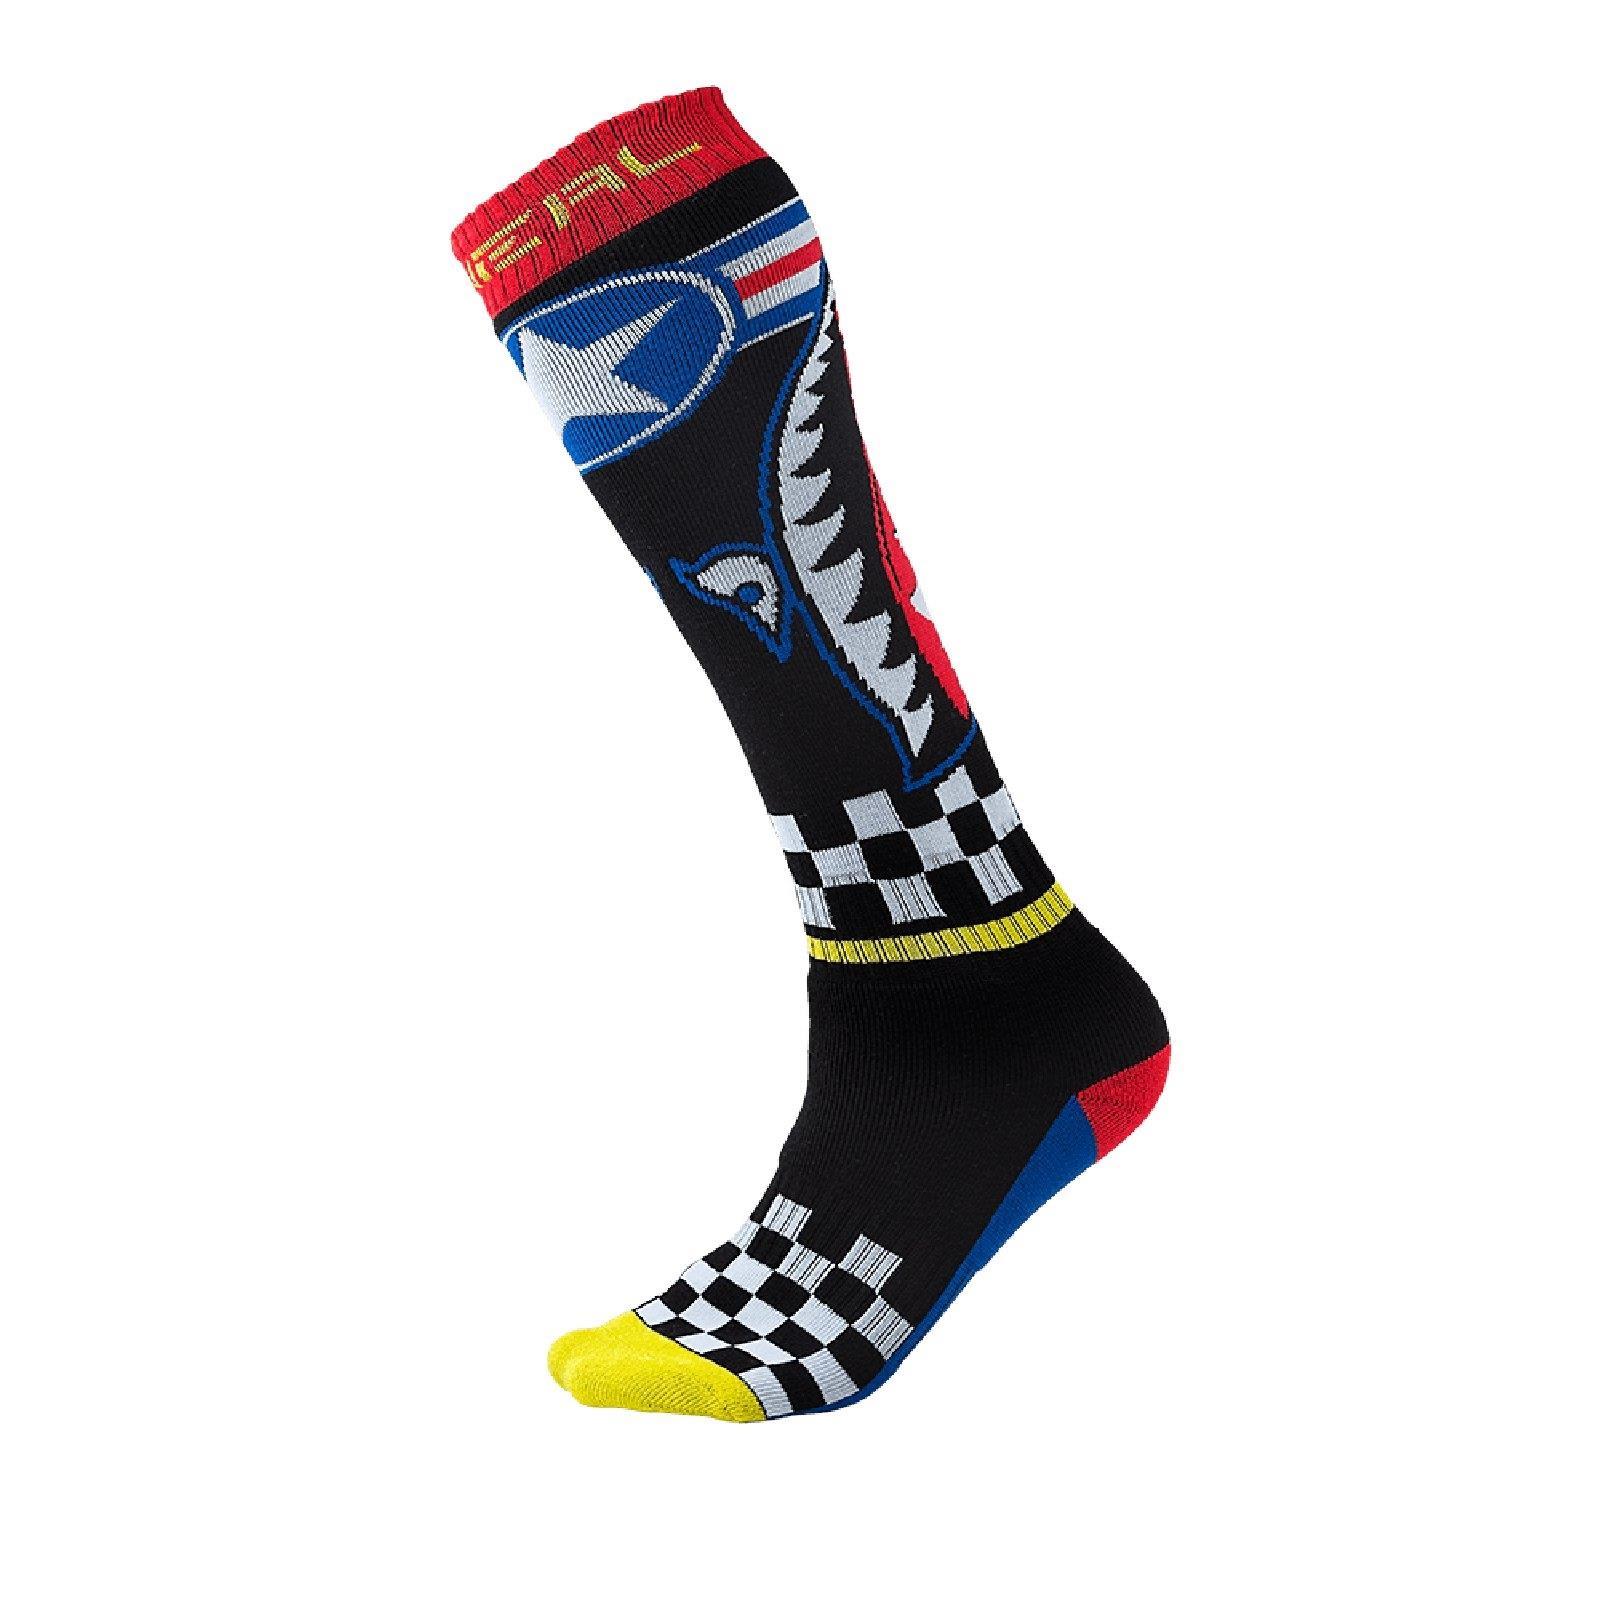 ONEAL-MOTO-CROSS-Calze-Moto-Enduro-MX-MTB-ATV-Quad-Calze-Sock-BICICLETTA-FR miniatura 53